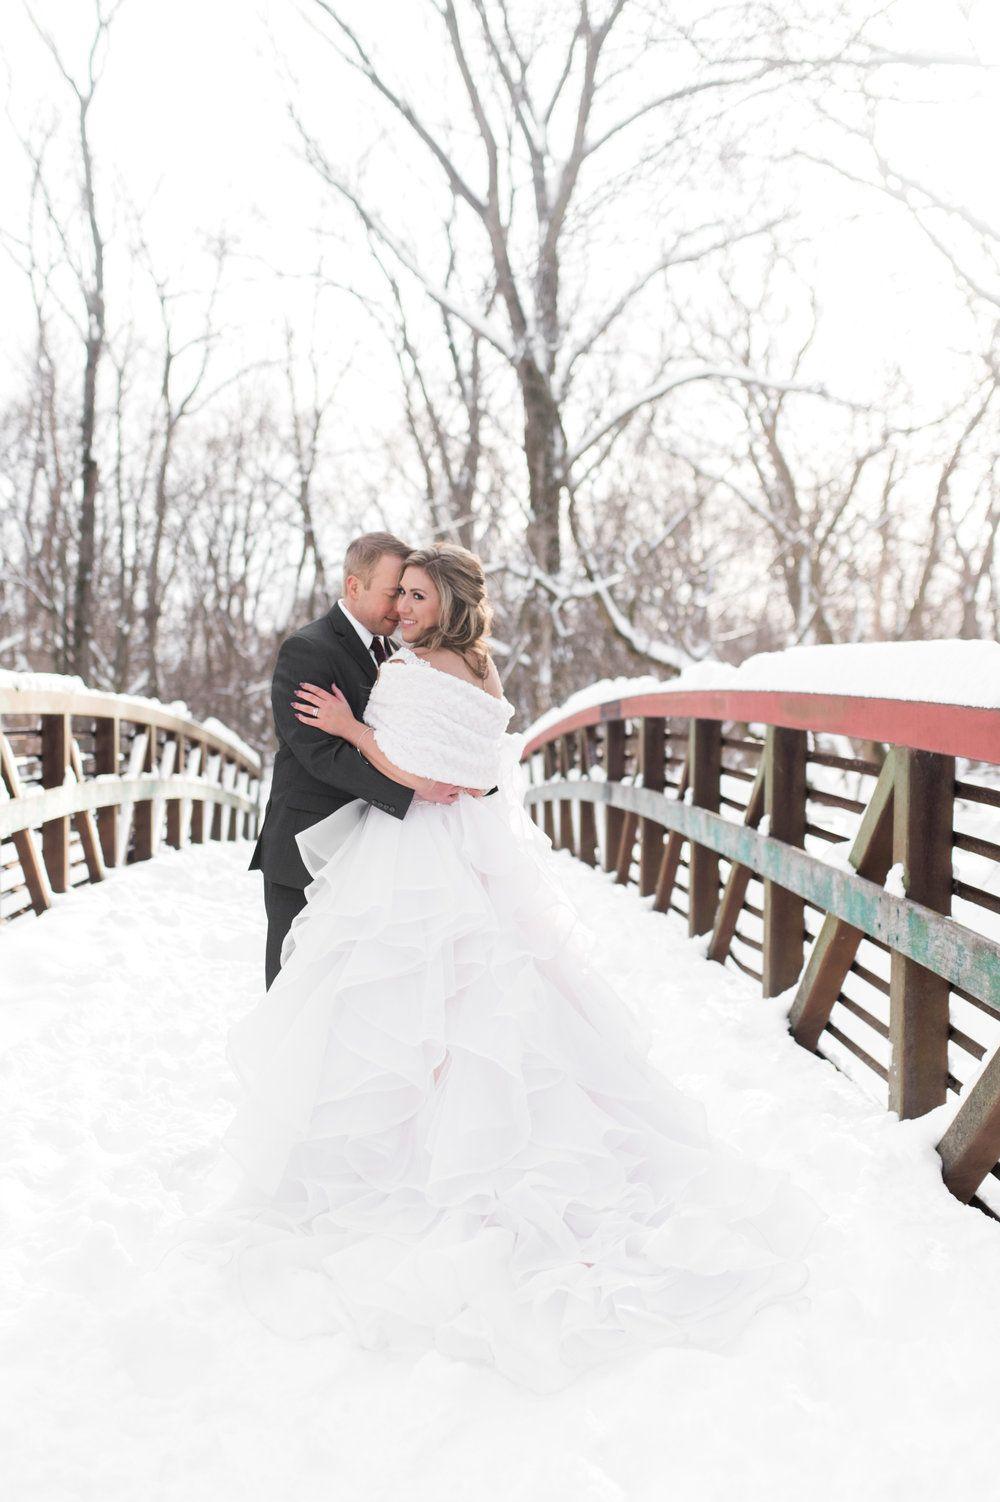 Winter Wedding at the Adler Planetarium in Chicago, IL ...